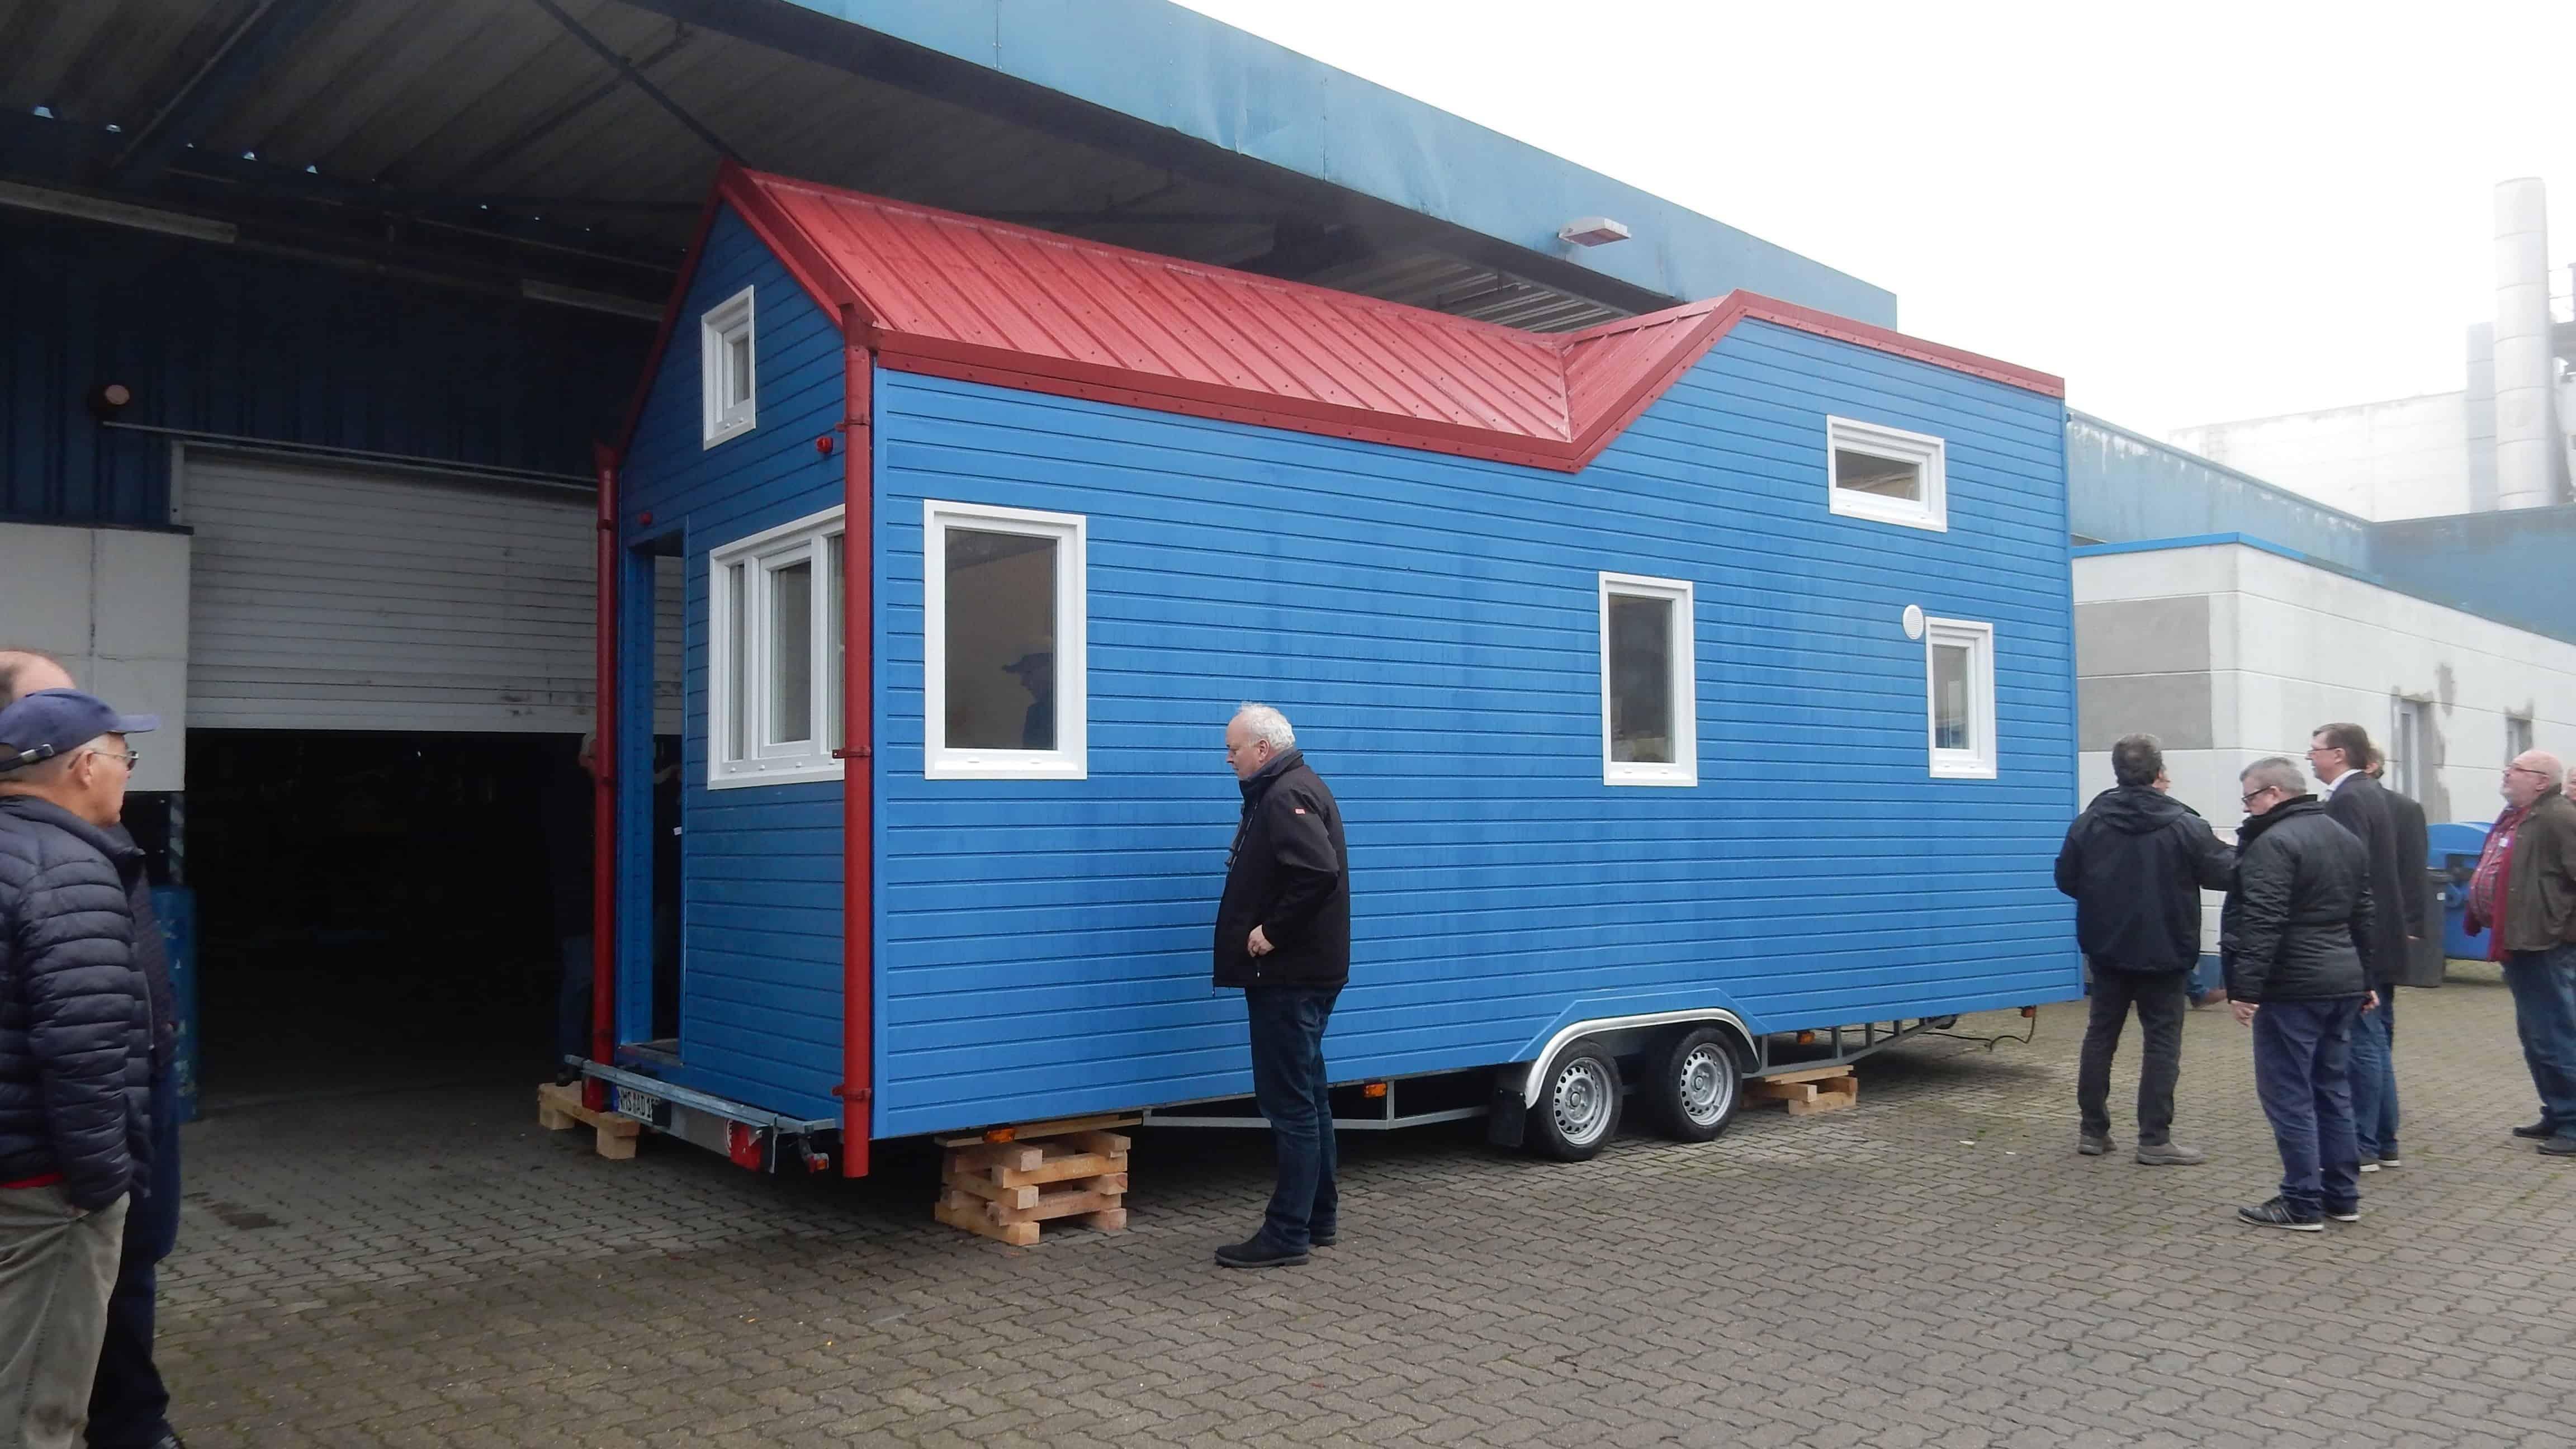 rth 171125 02 immofux com immobilien portal. Black Bedroom Furniture Sets. Home Design Ideas